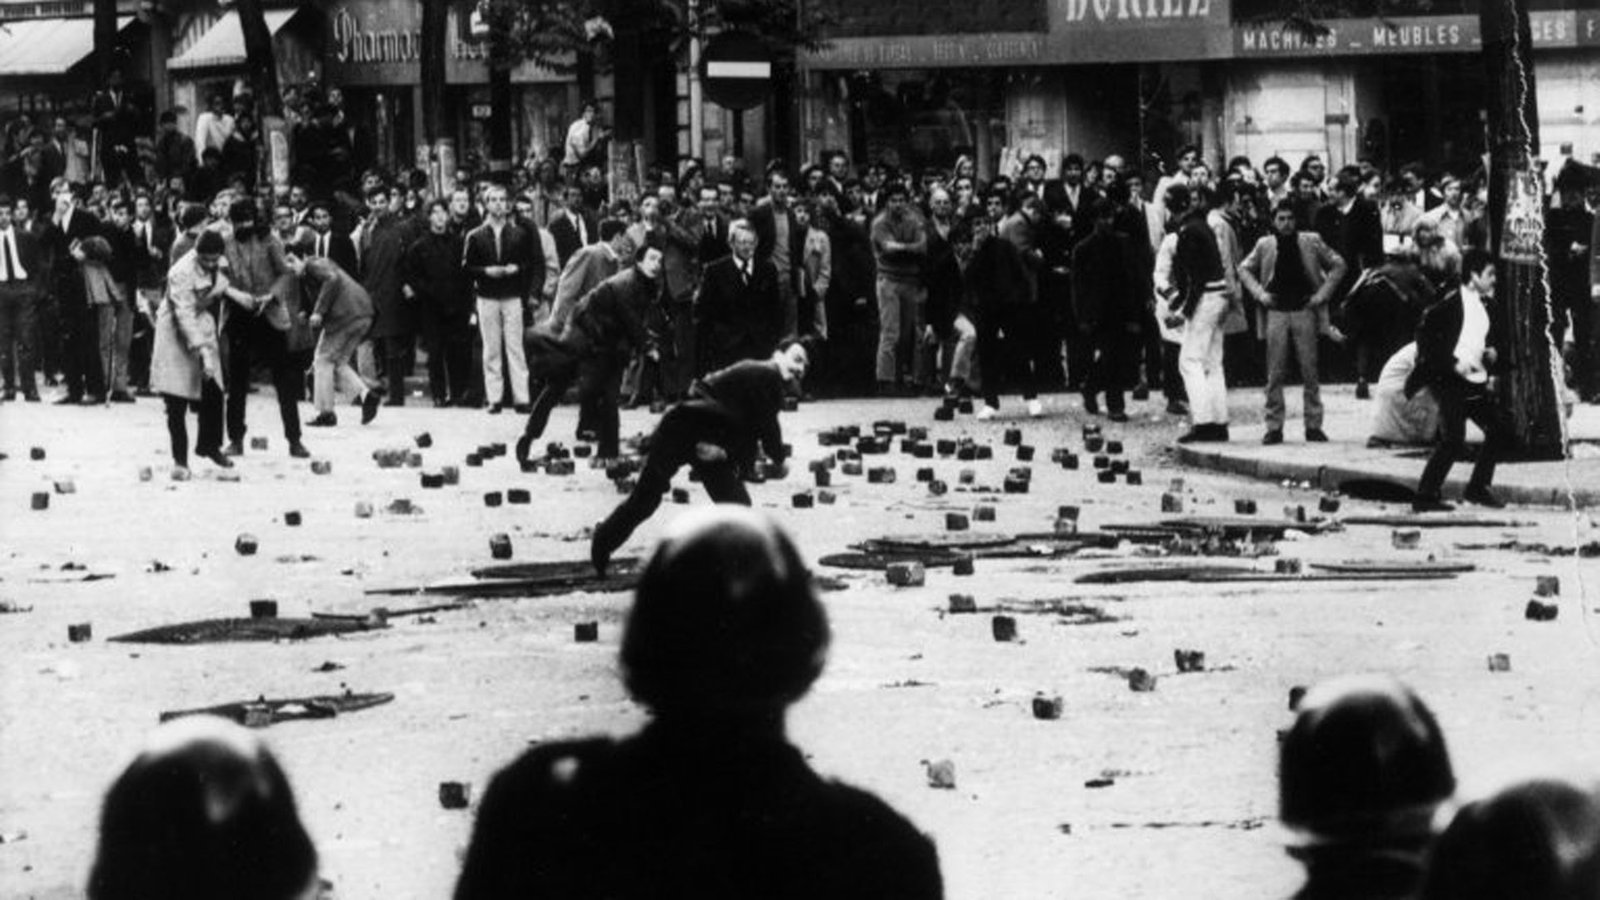 Studentenbewegung: Internationale Studentenproteste ...